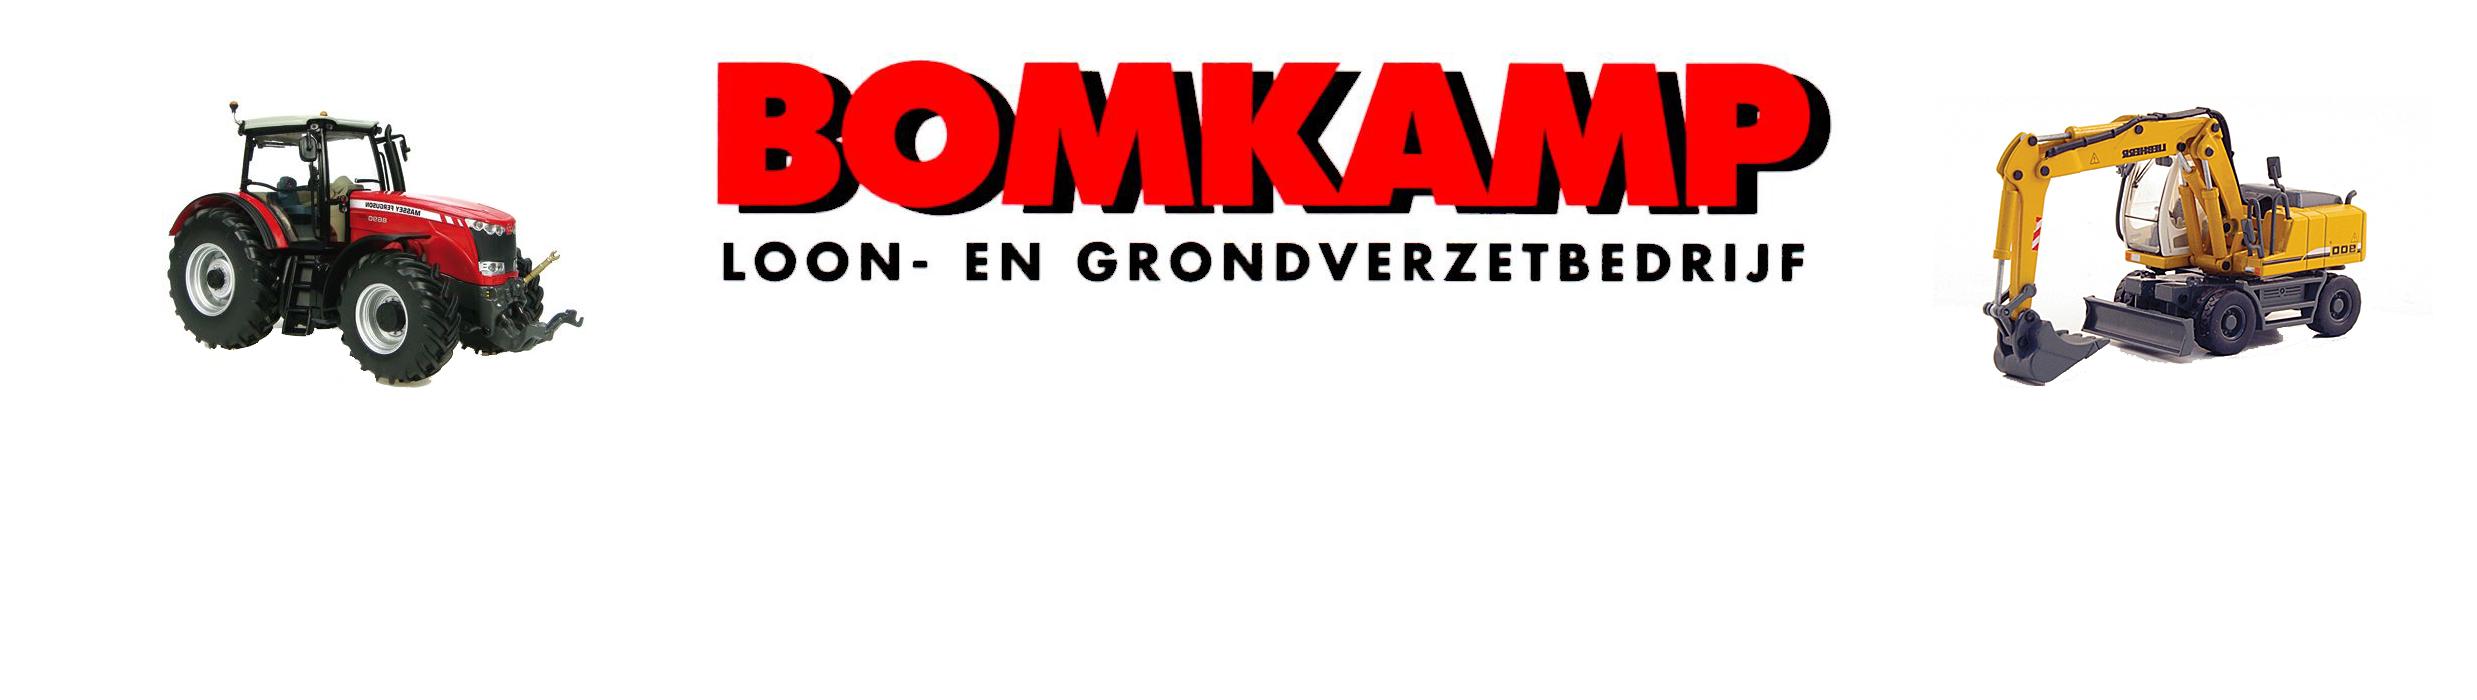 Loon en grondverzetbedrijf Bomkamp